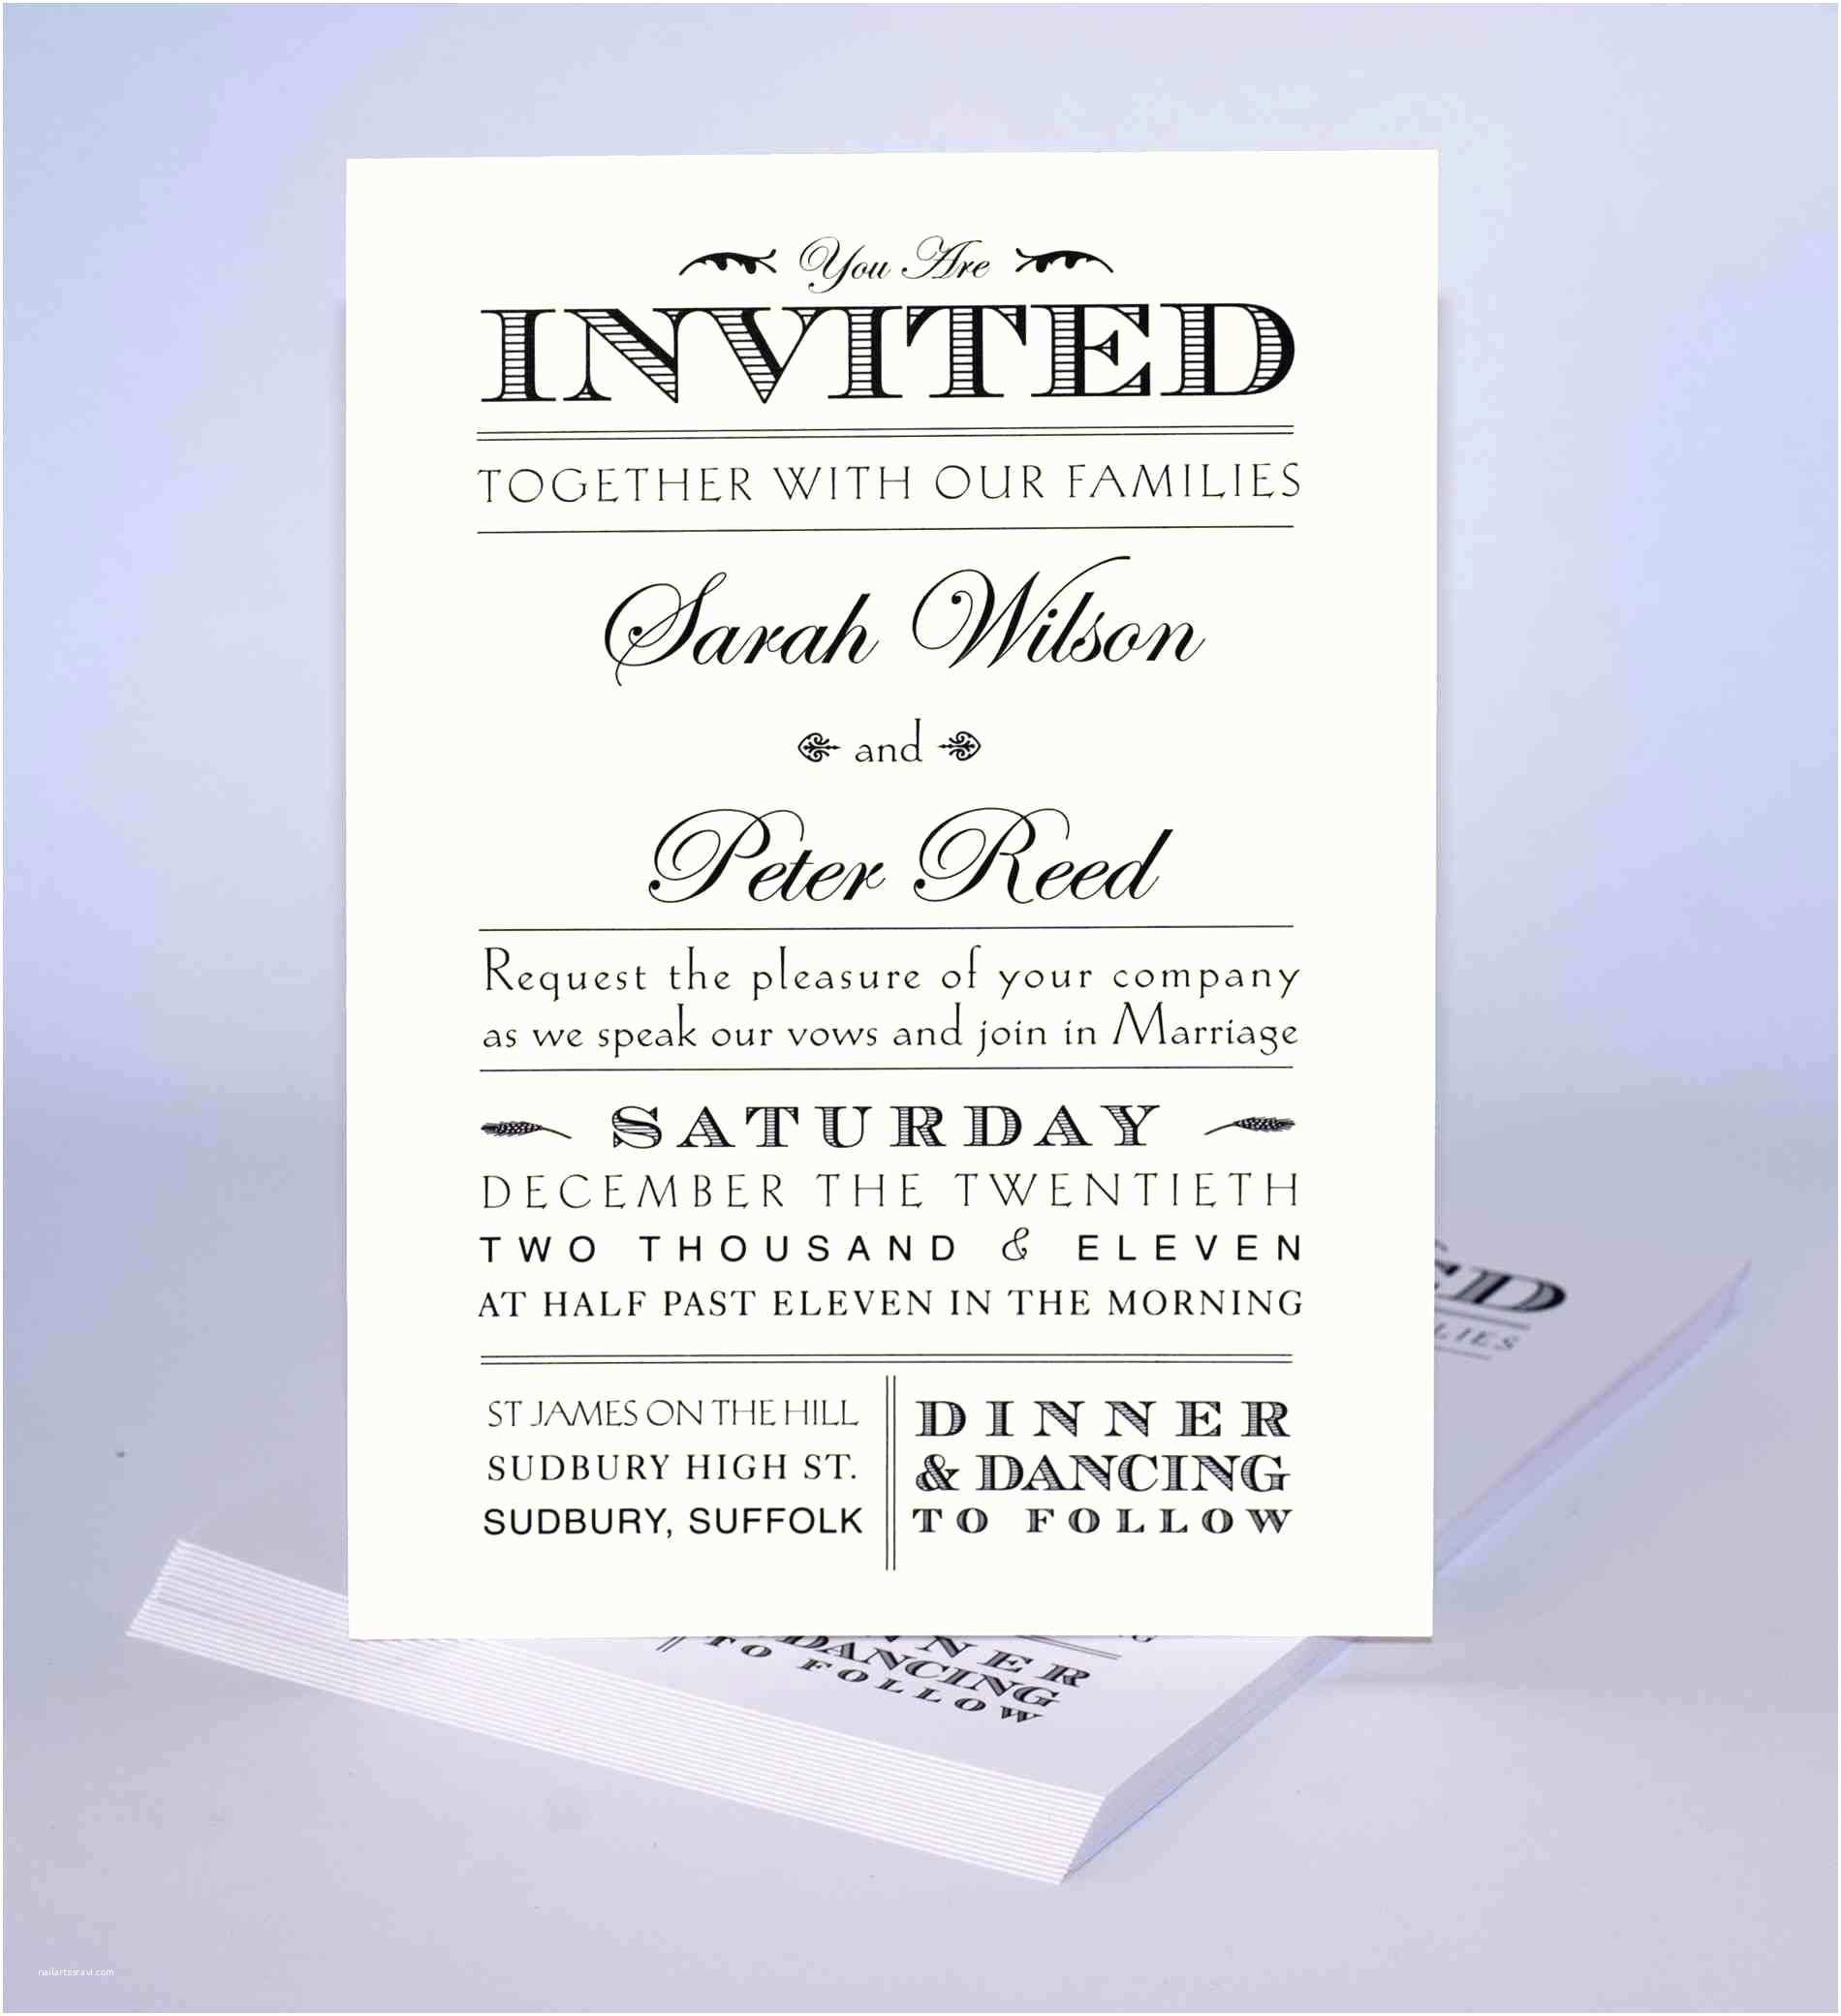 Wedding Invitation Wording Ideas Unique Wedding Invitations Samples